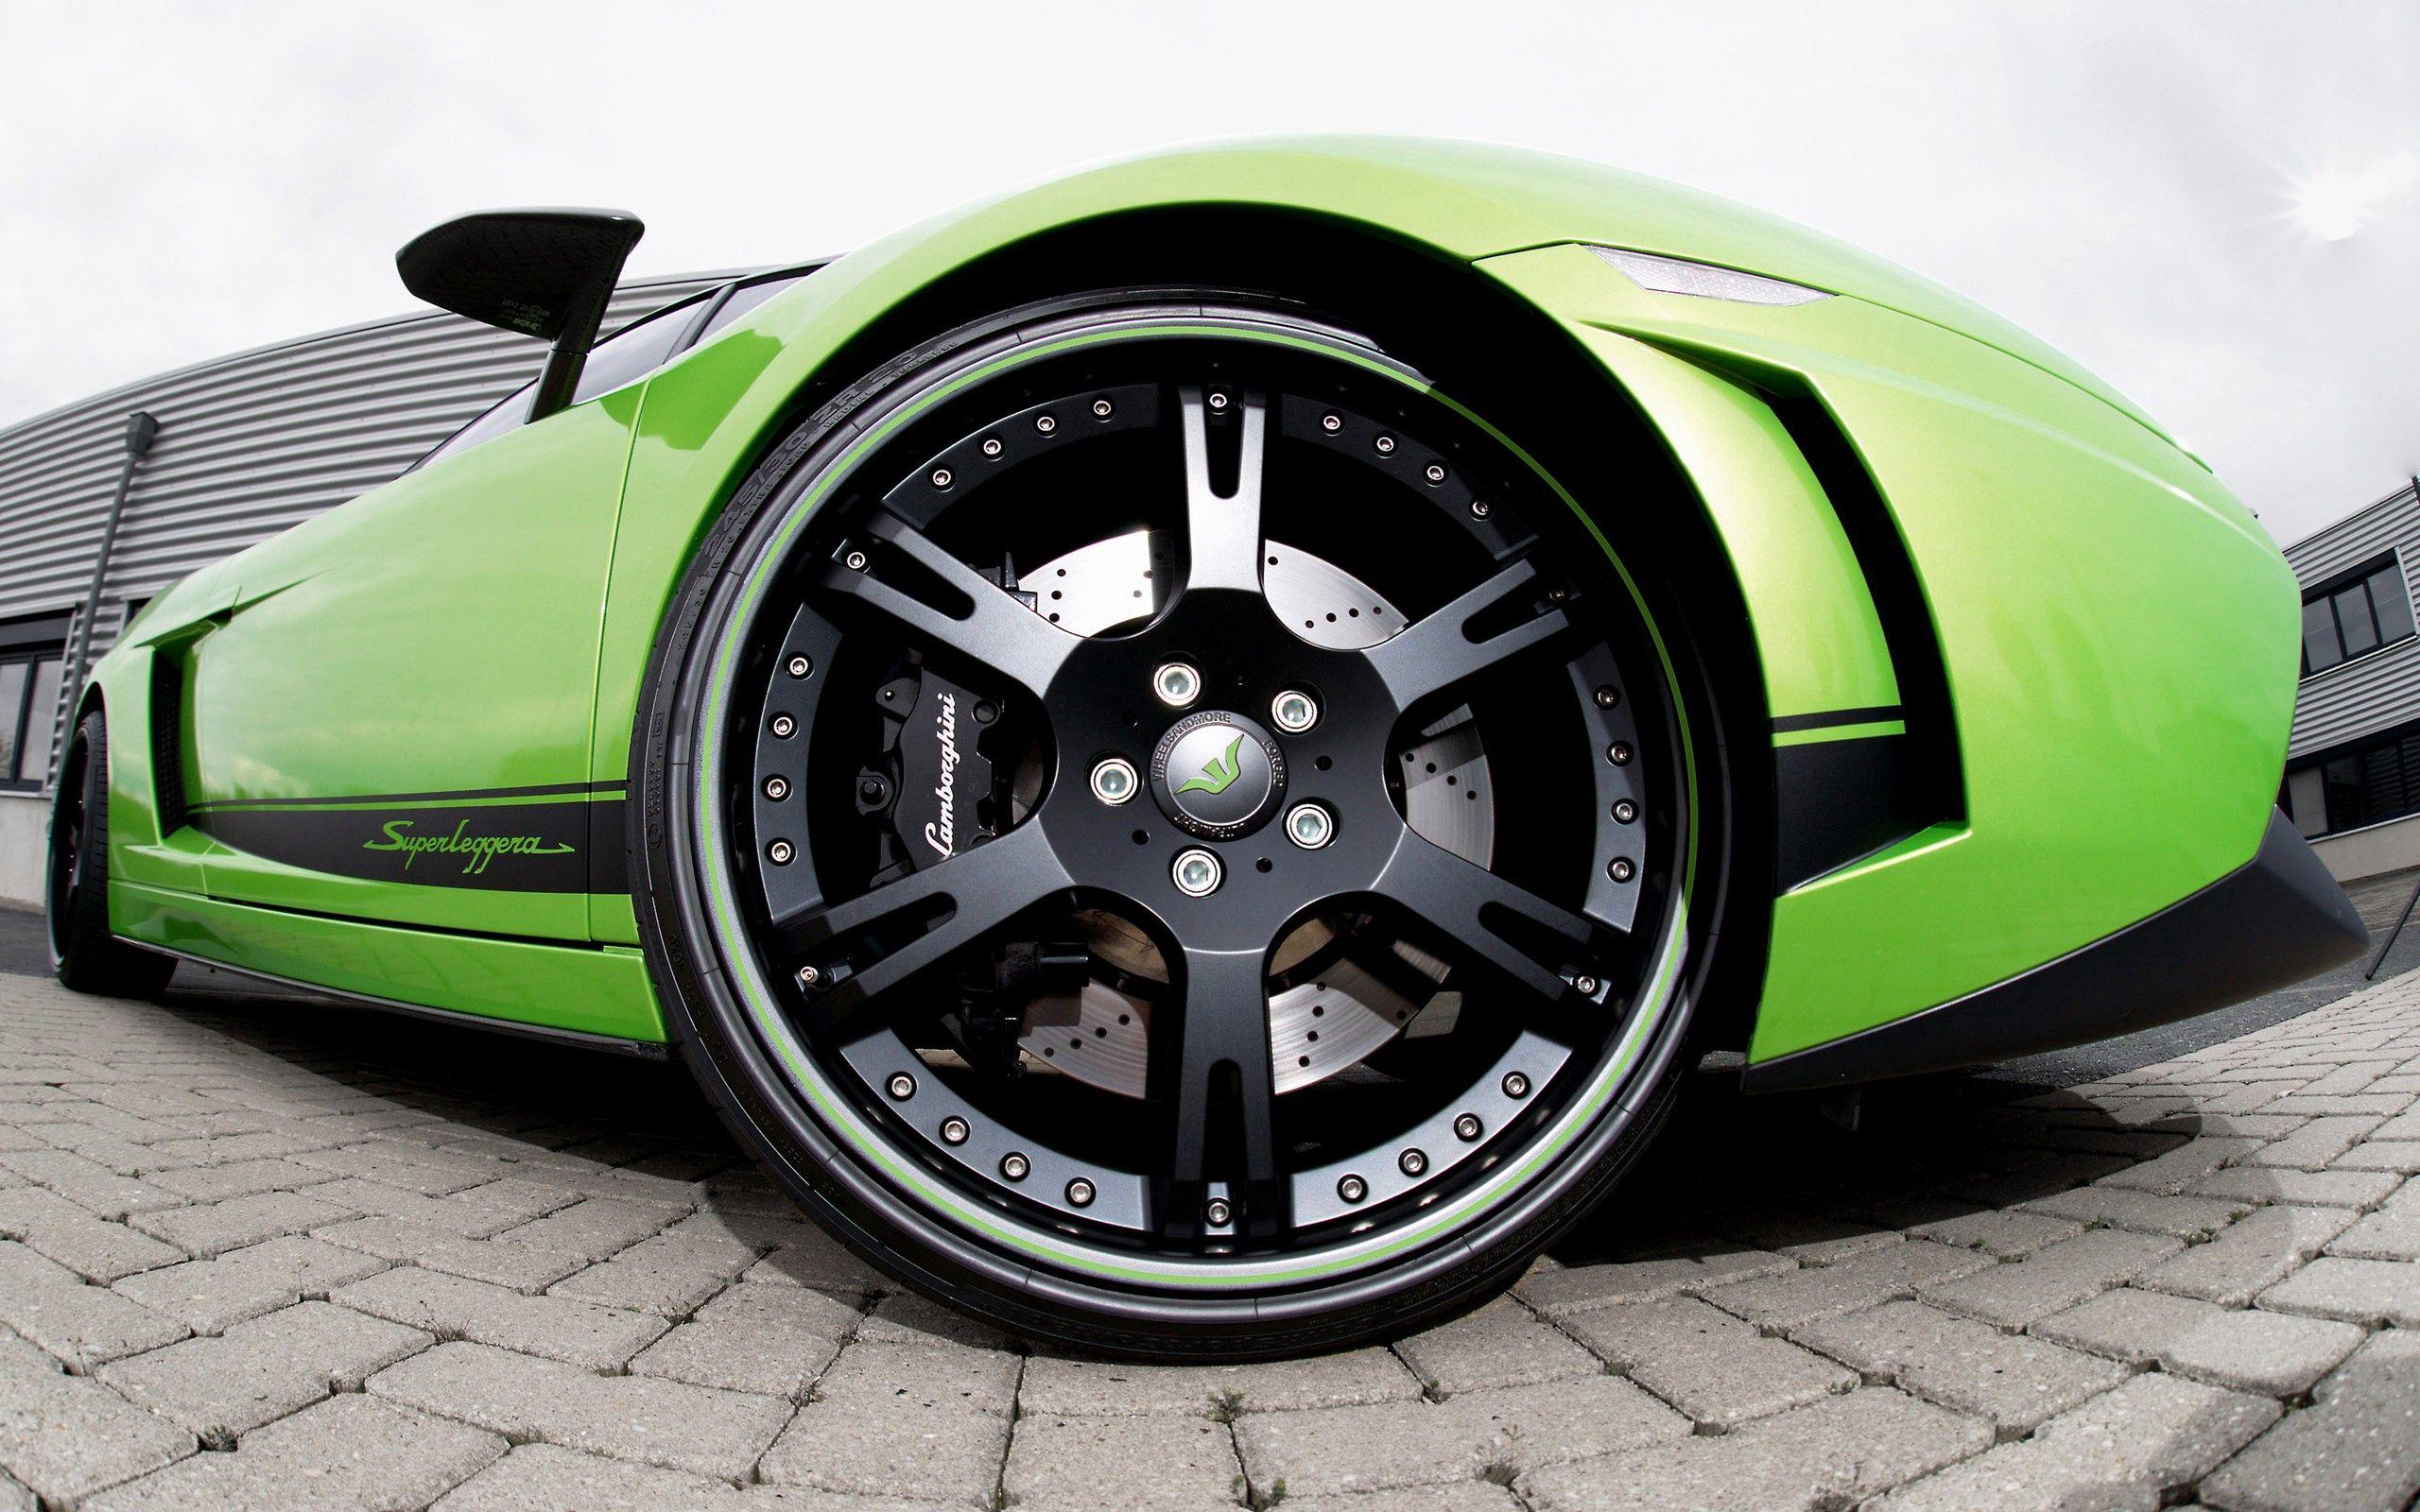 108792 скачать обои Ламборджини (Lamborghini), Тачки (Cars), Зеленый, Колесо - заставки и картинки бесплатно